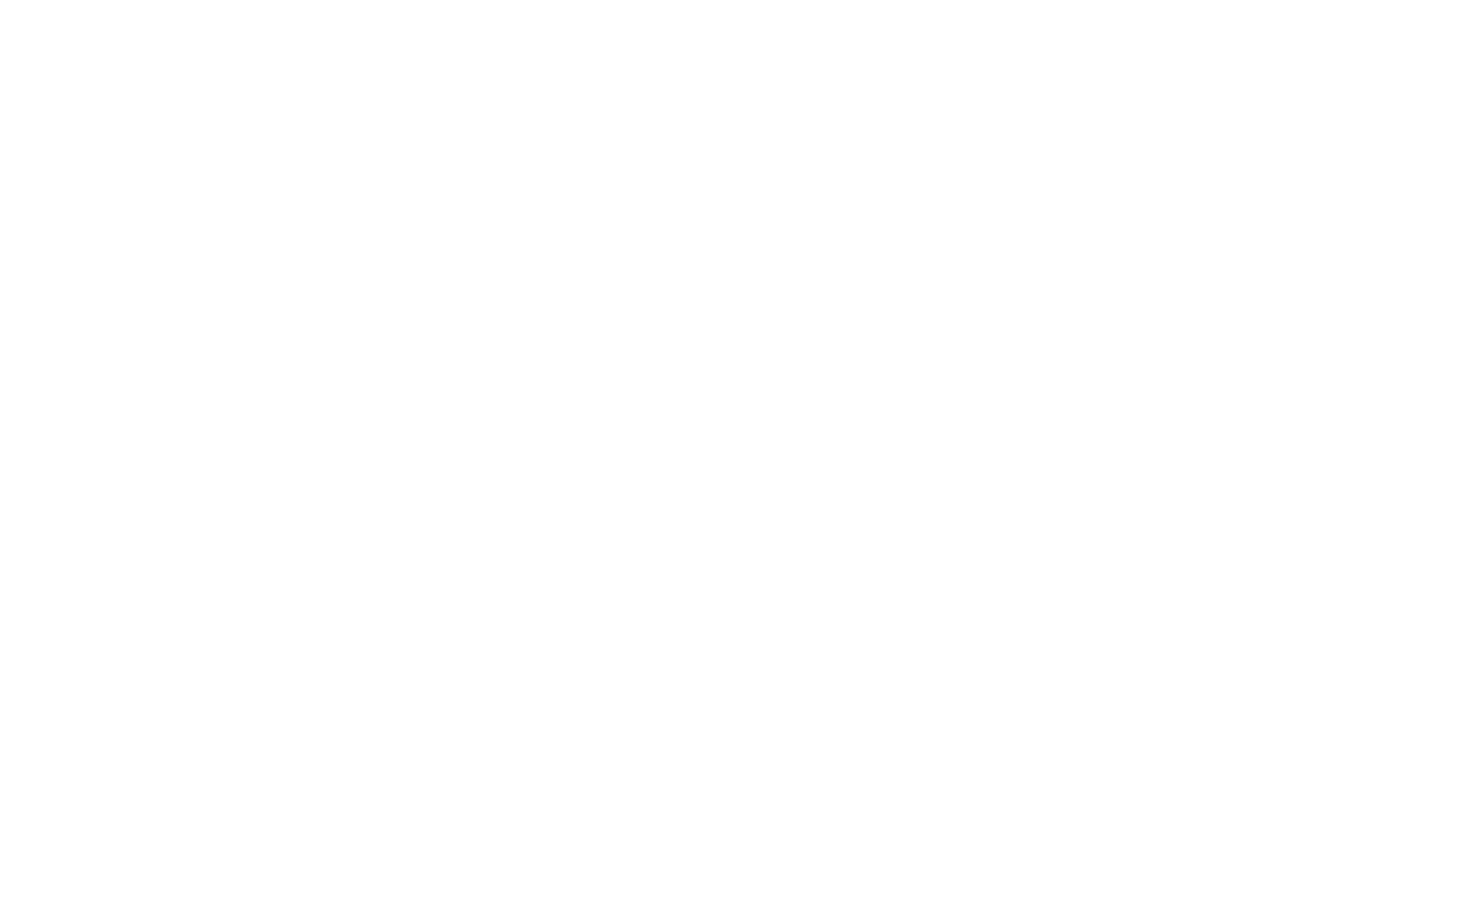 Iron Mining Association - Careers in mining